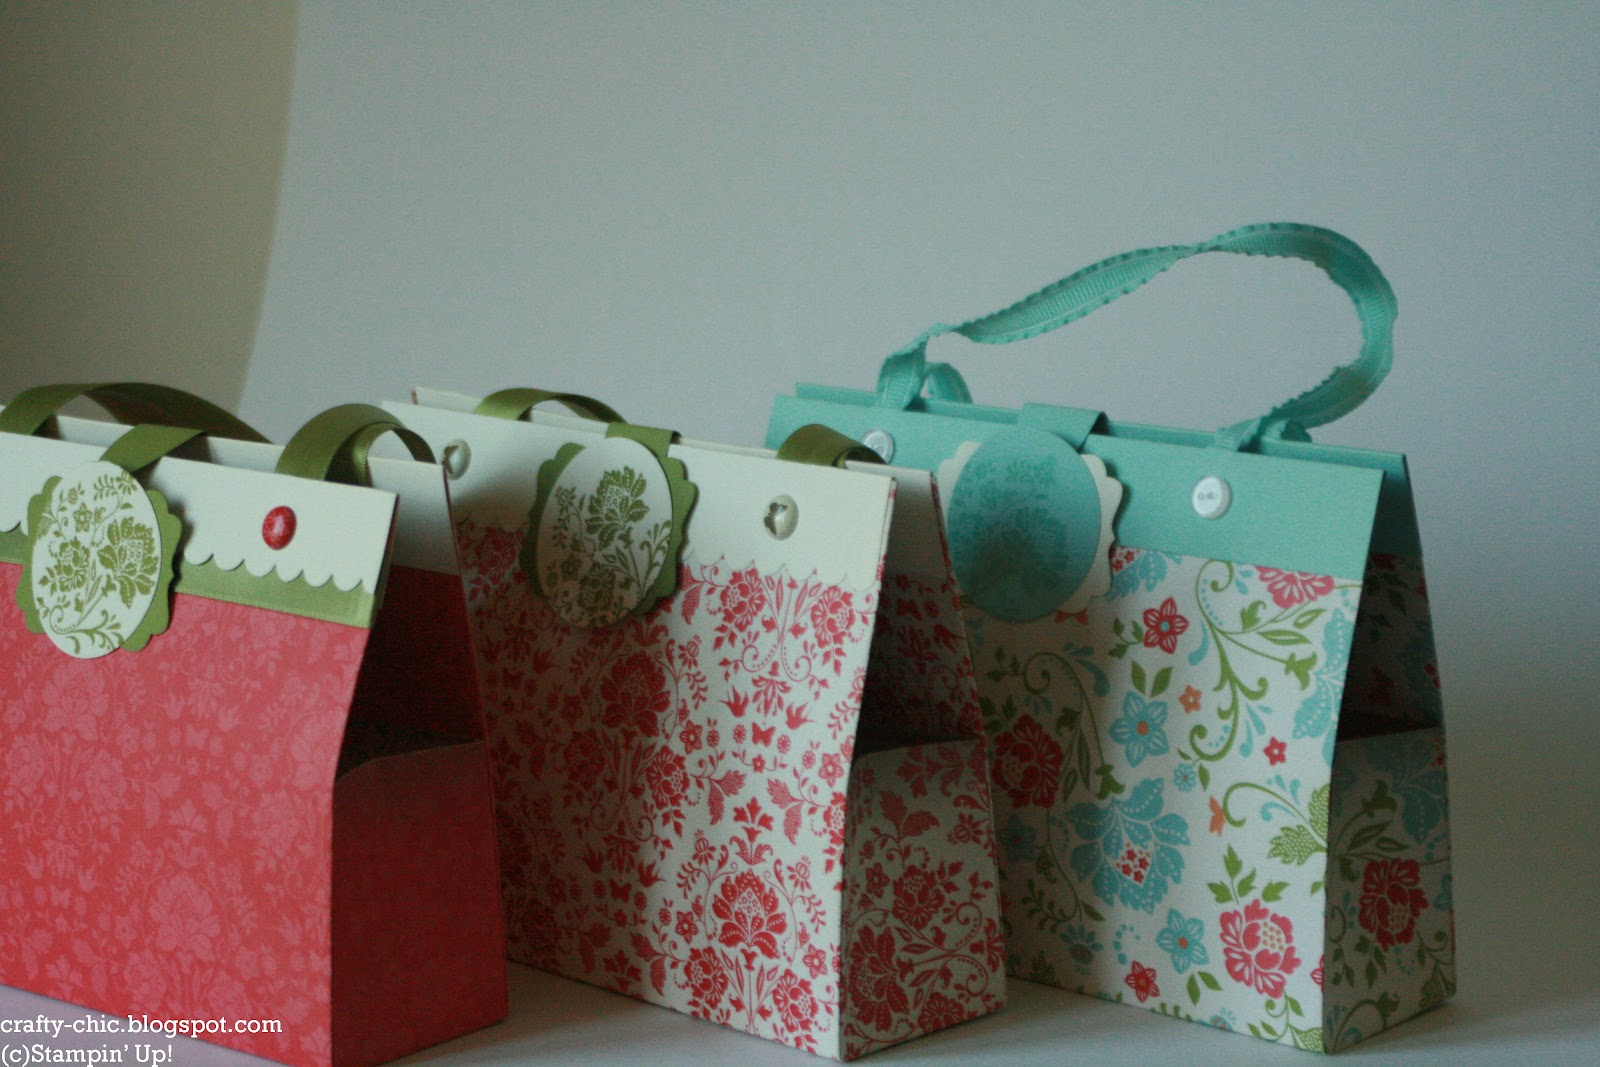 Crafty Chic Stampin Up Blog Stamp Crazy Handbag Gift Bag Tutorial